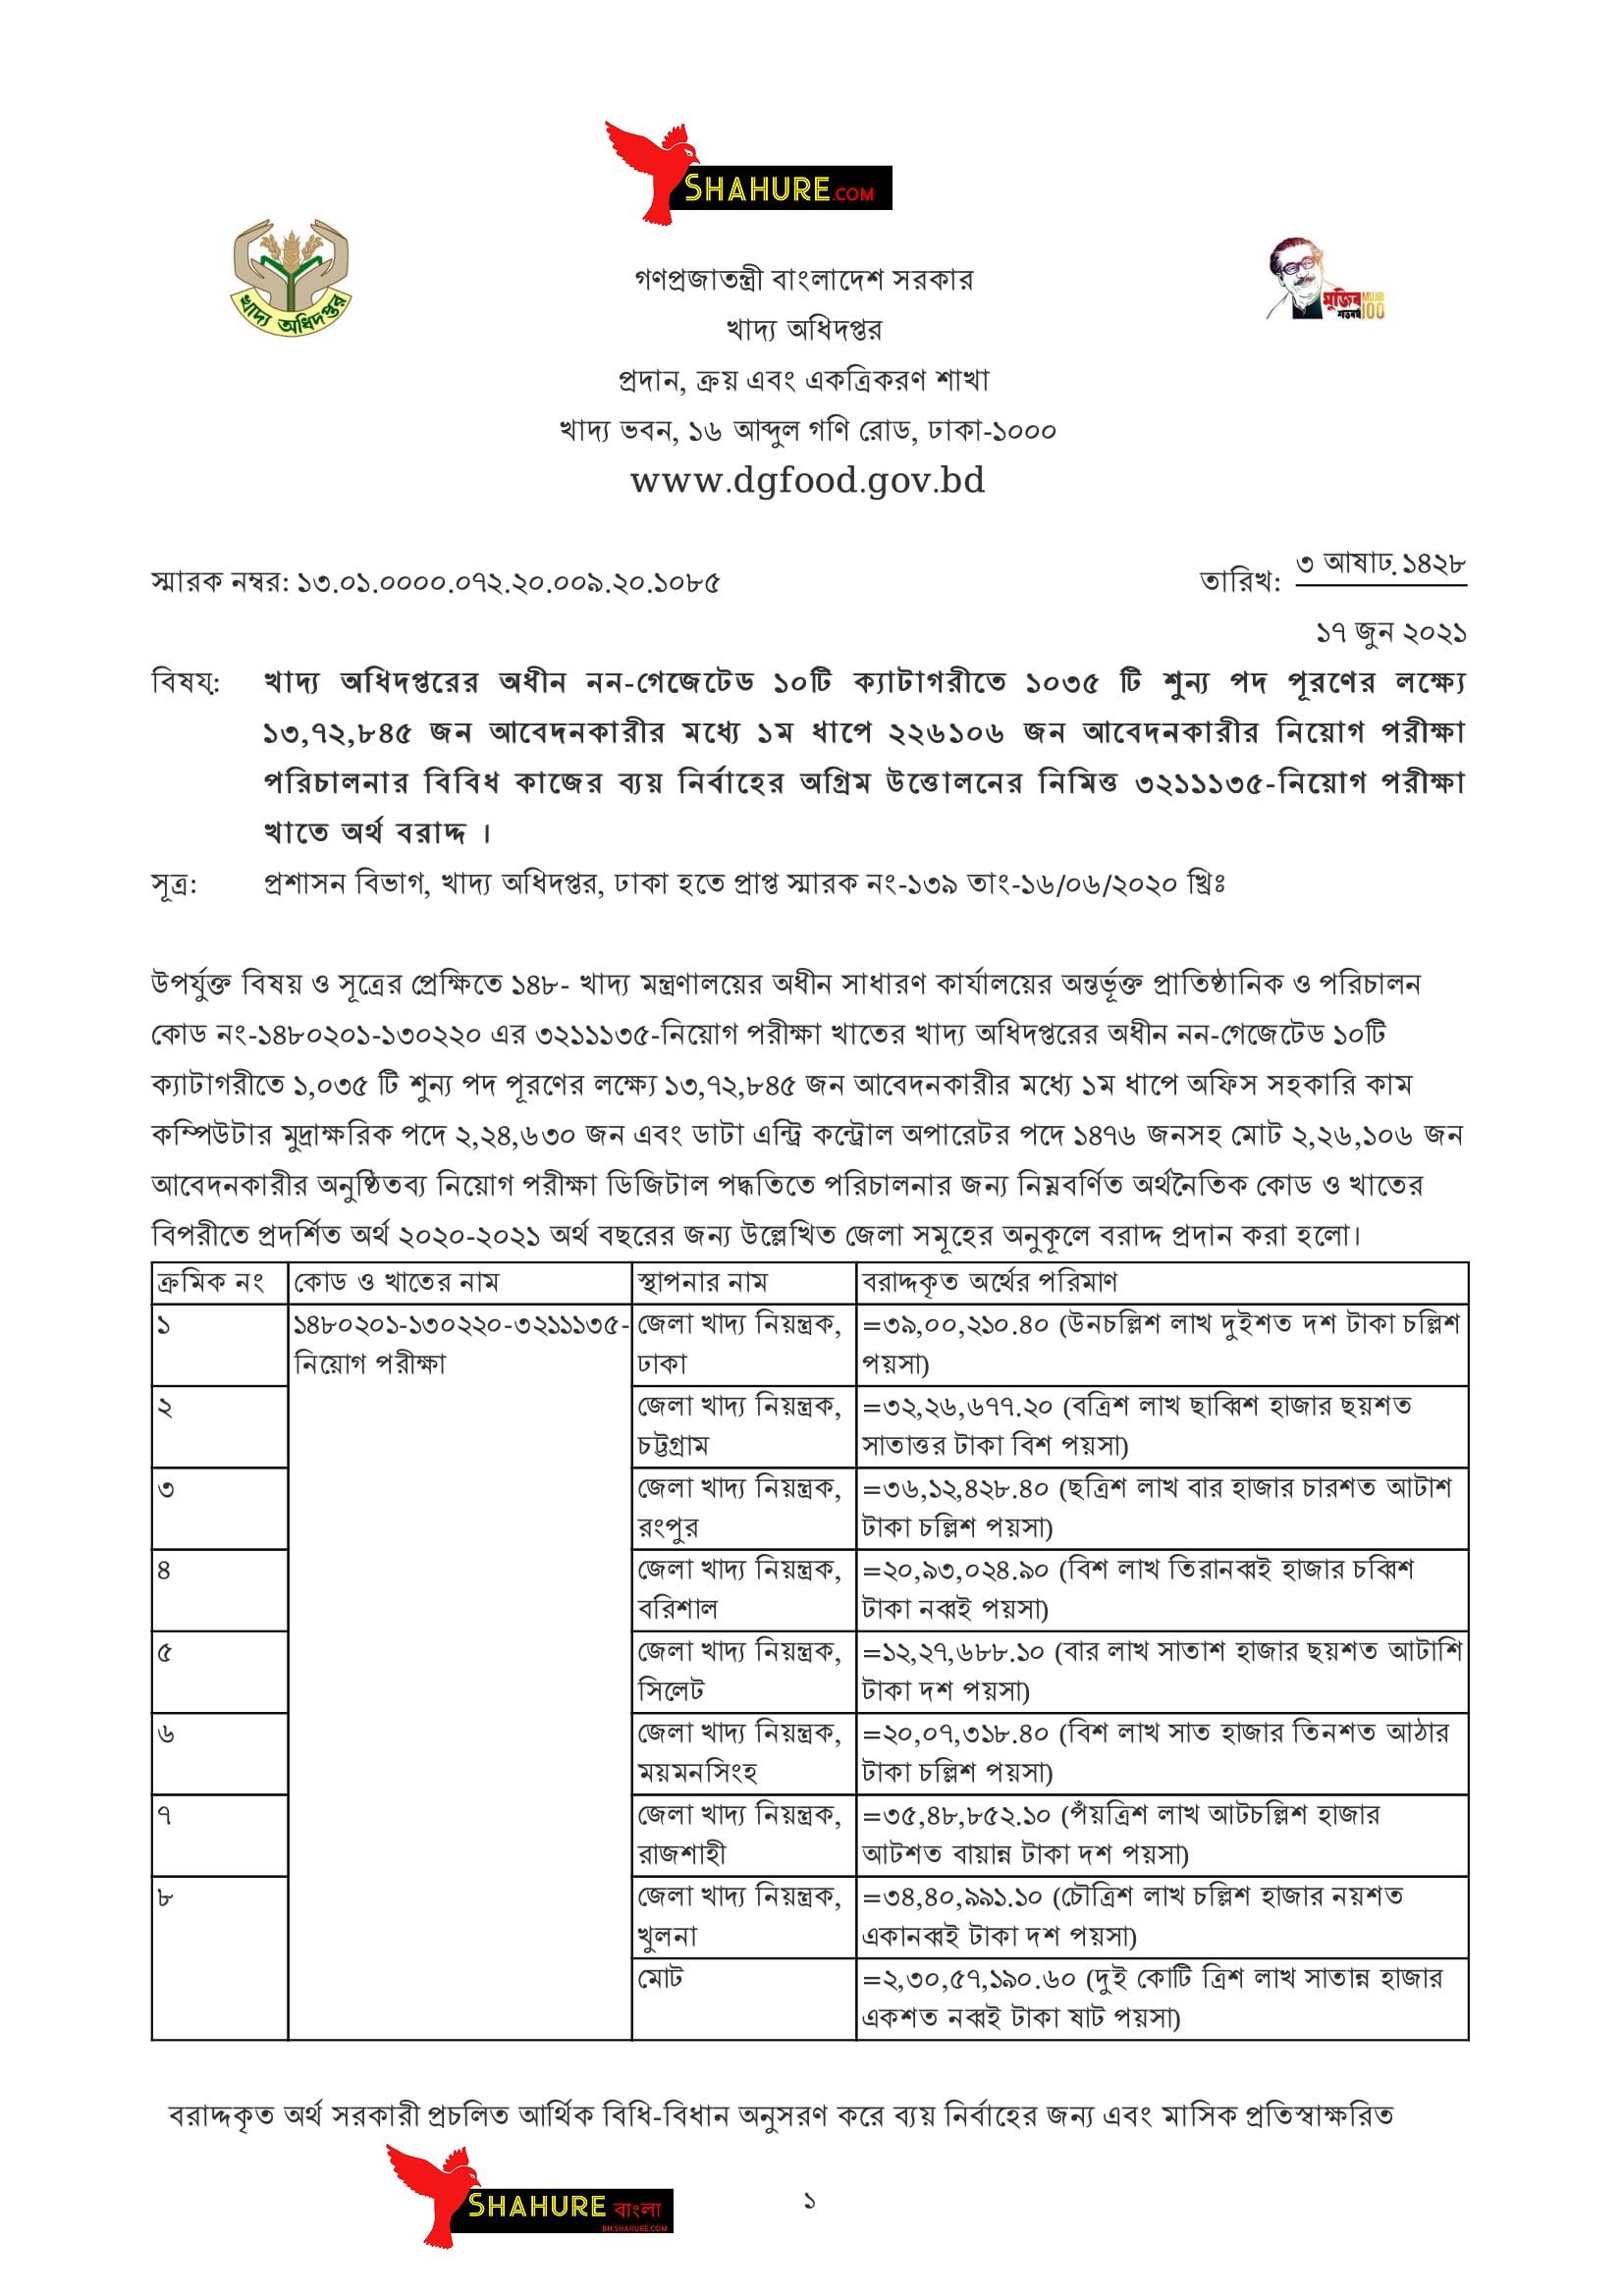 DgFood Exam Related Notice 2021